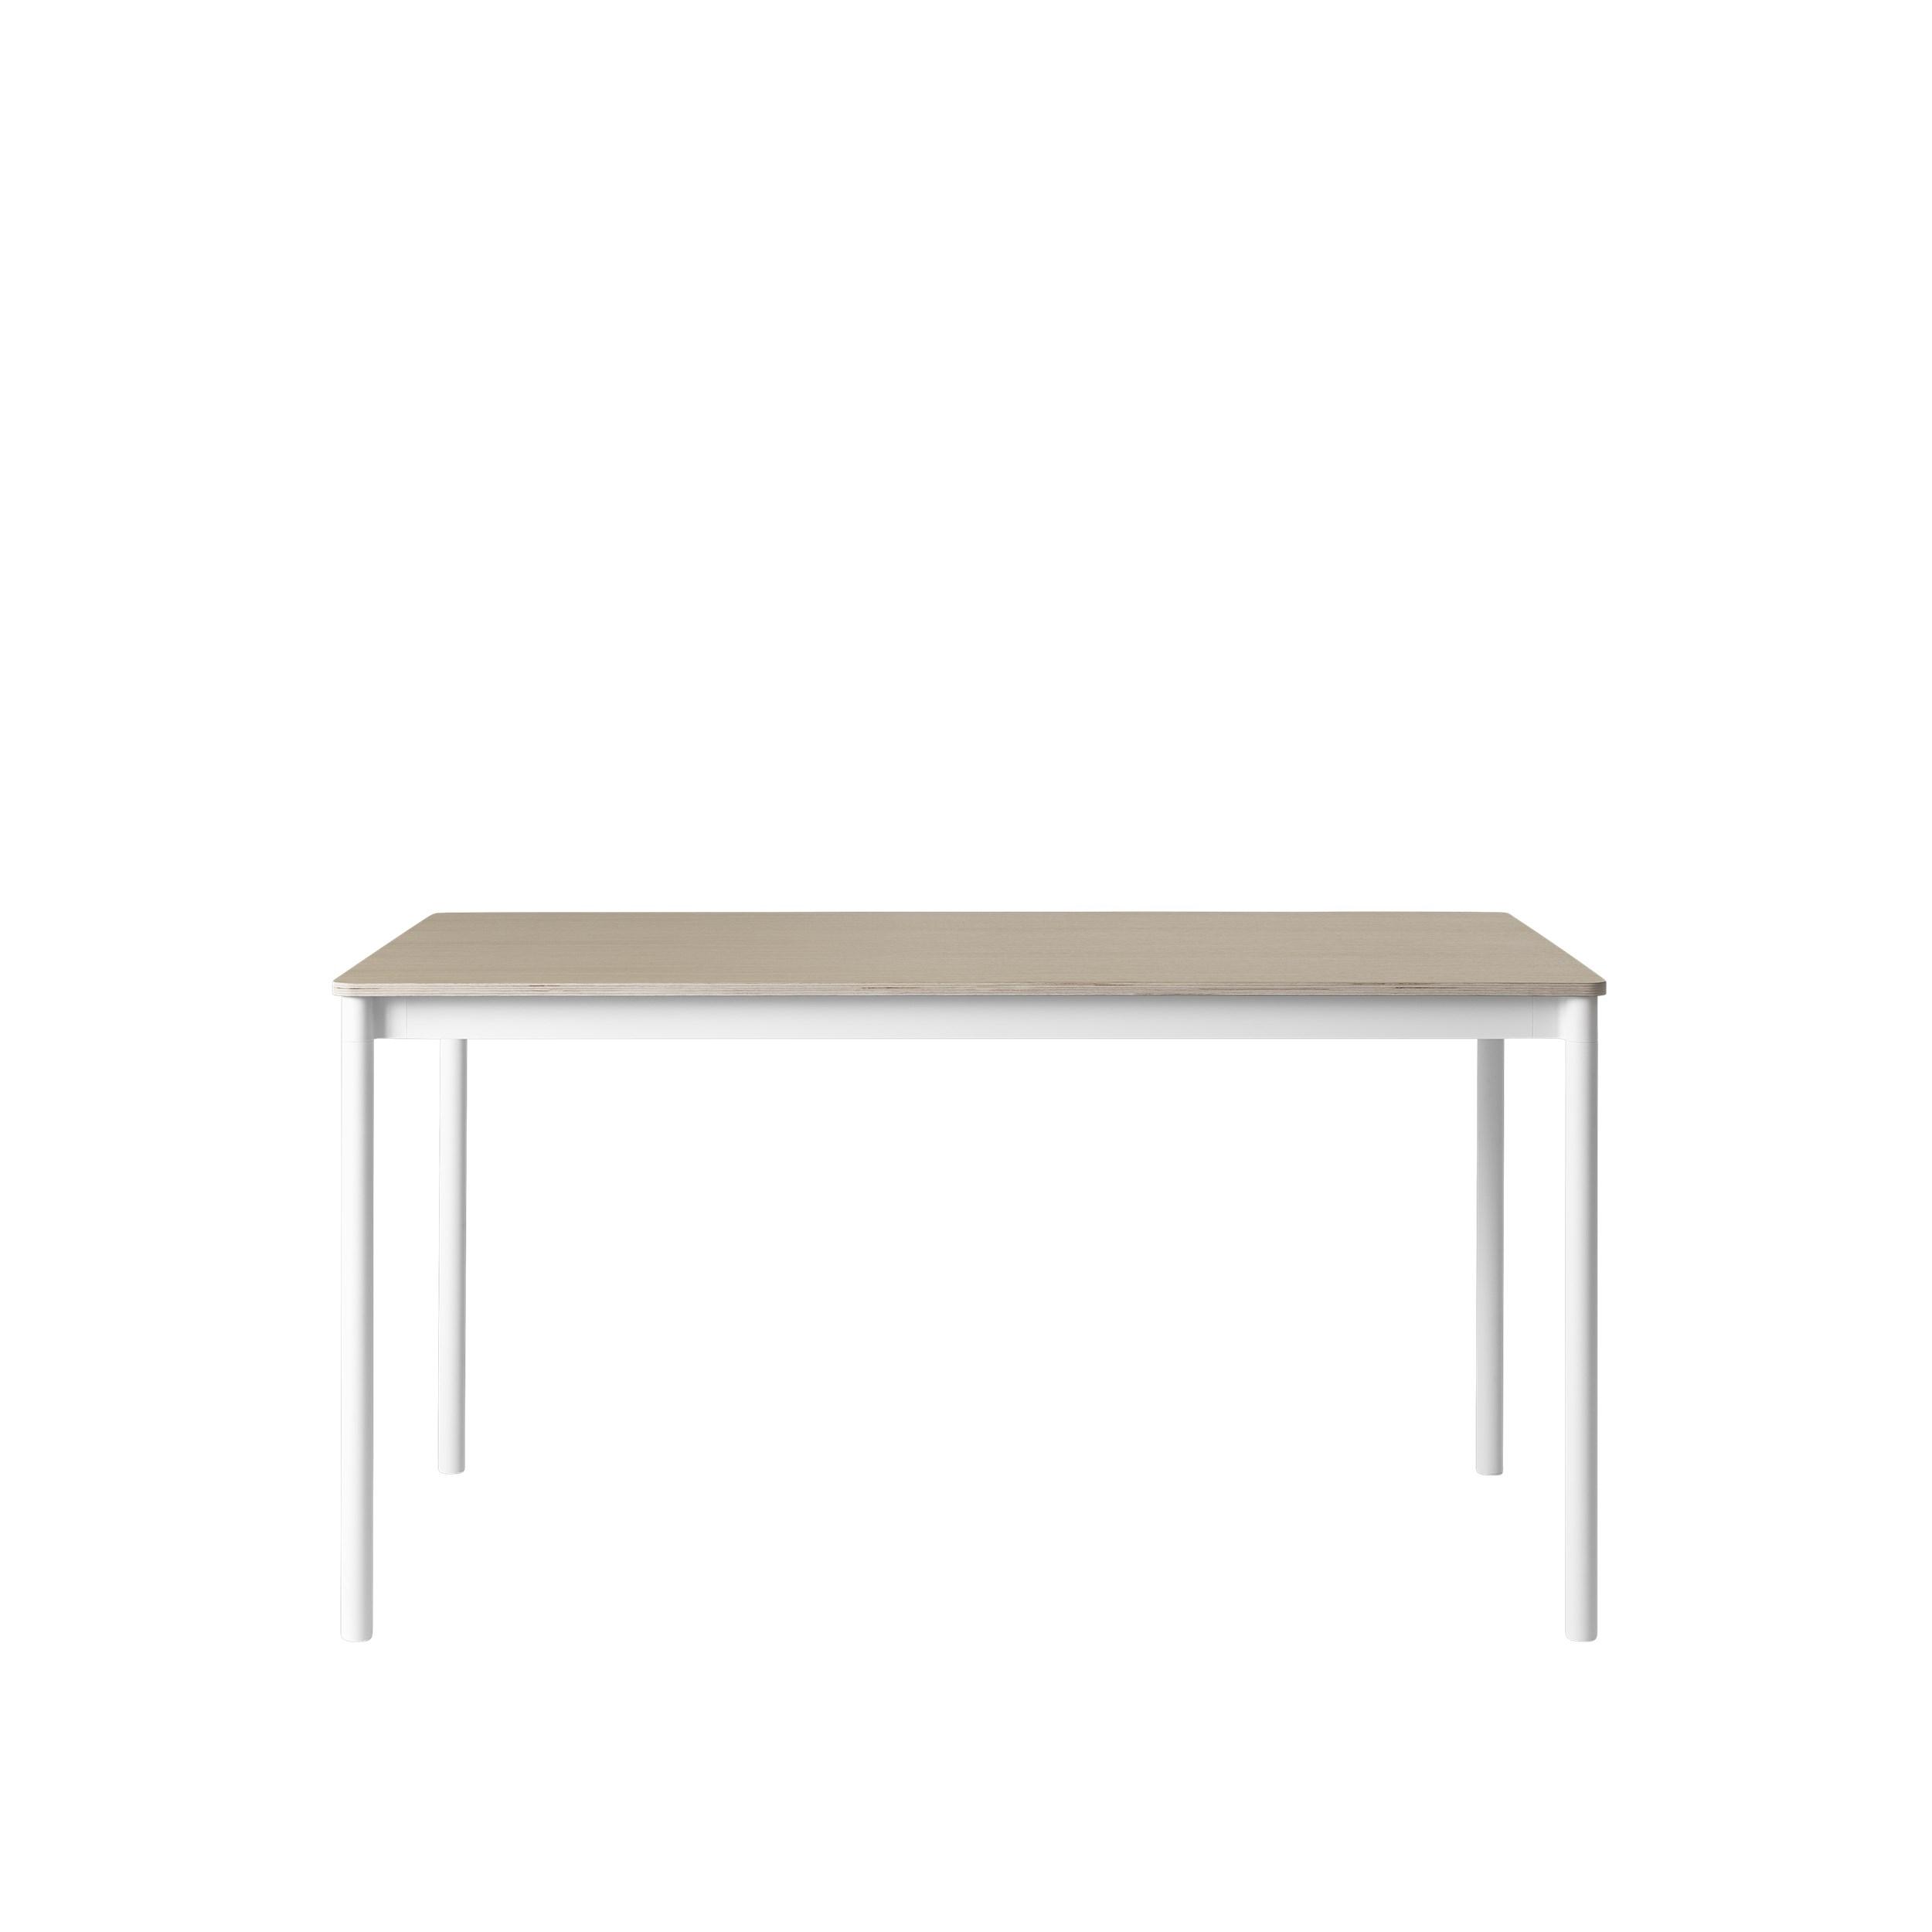 Muuto Base tafel 190x85 Oak Veneer/Plywood/White